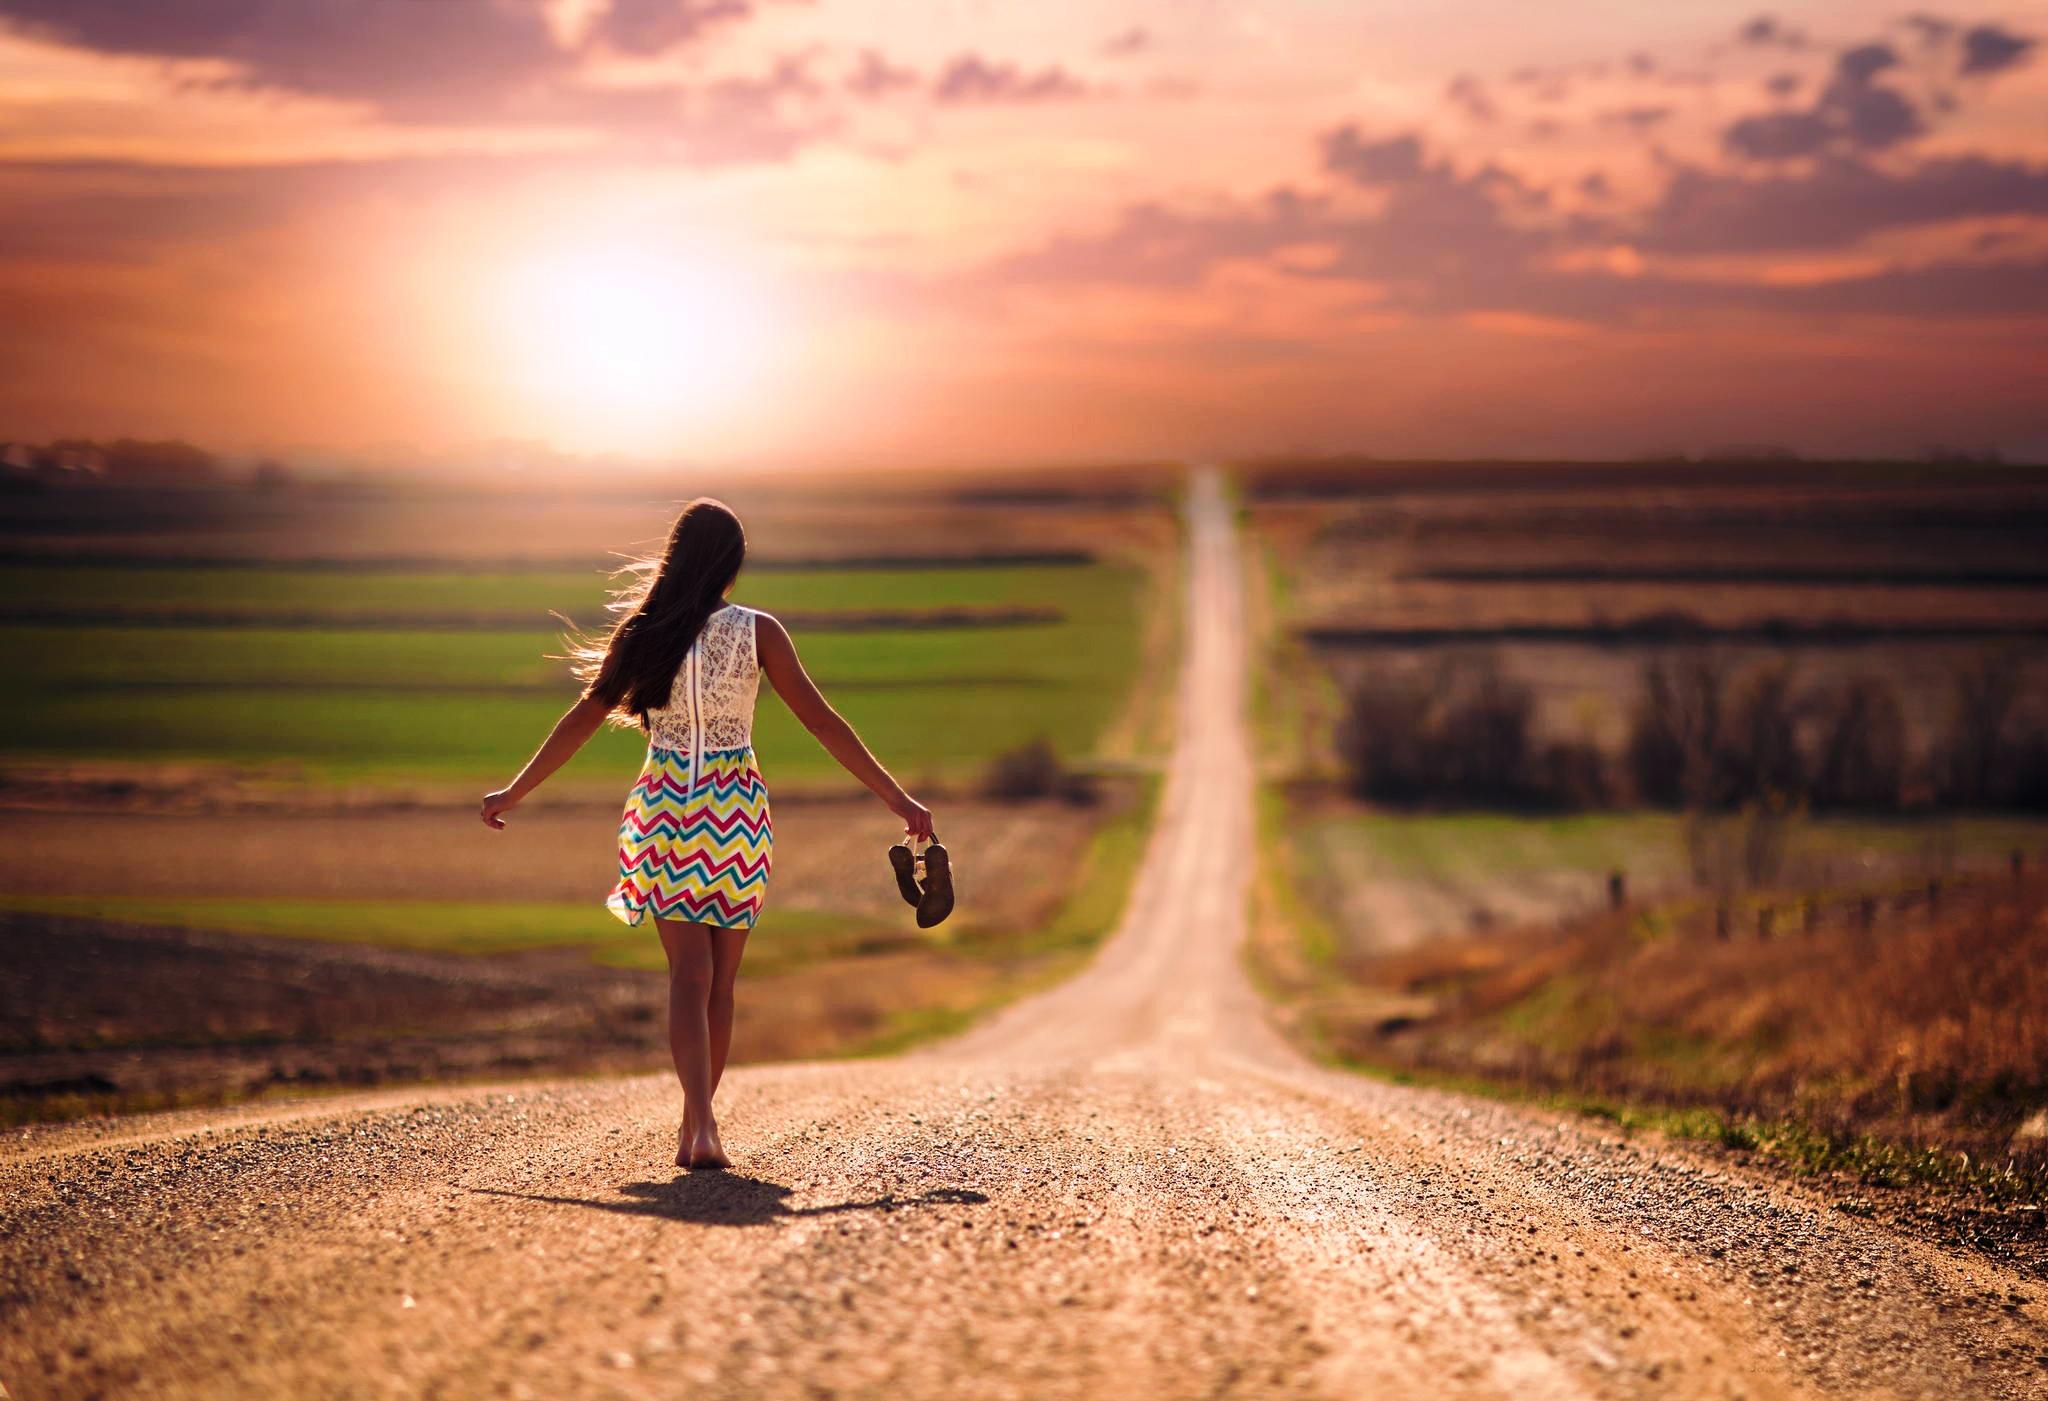 sunset-girl-nature-woman-road-sun-sky-splendor-beauty-1738929-2048x1401.jpg